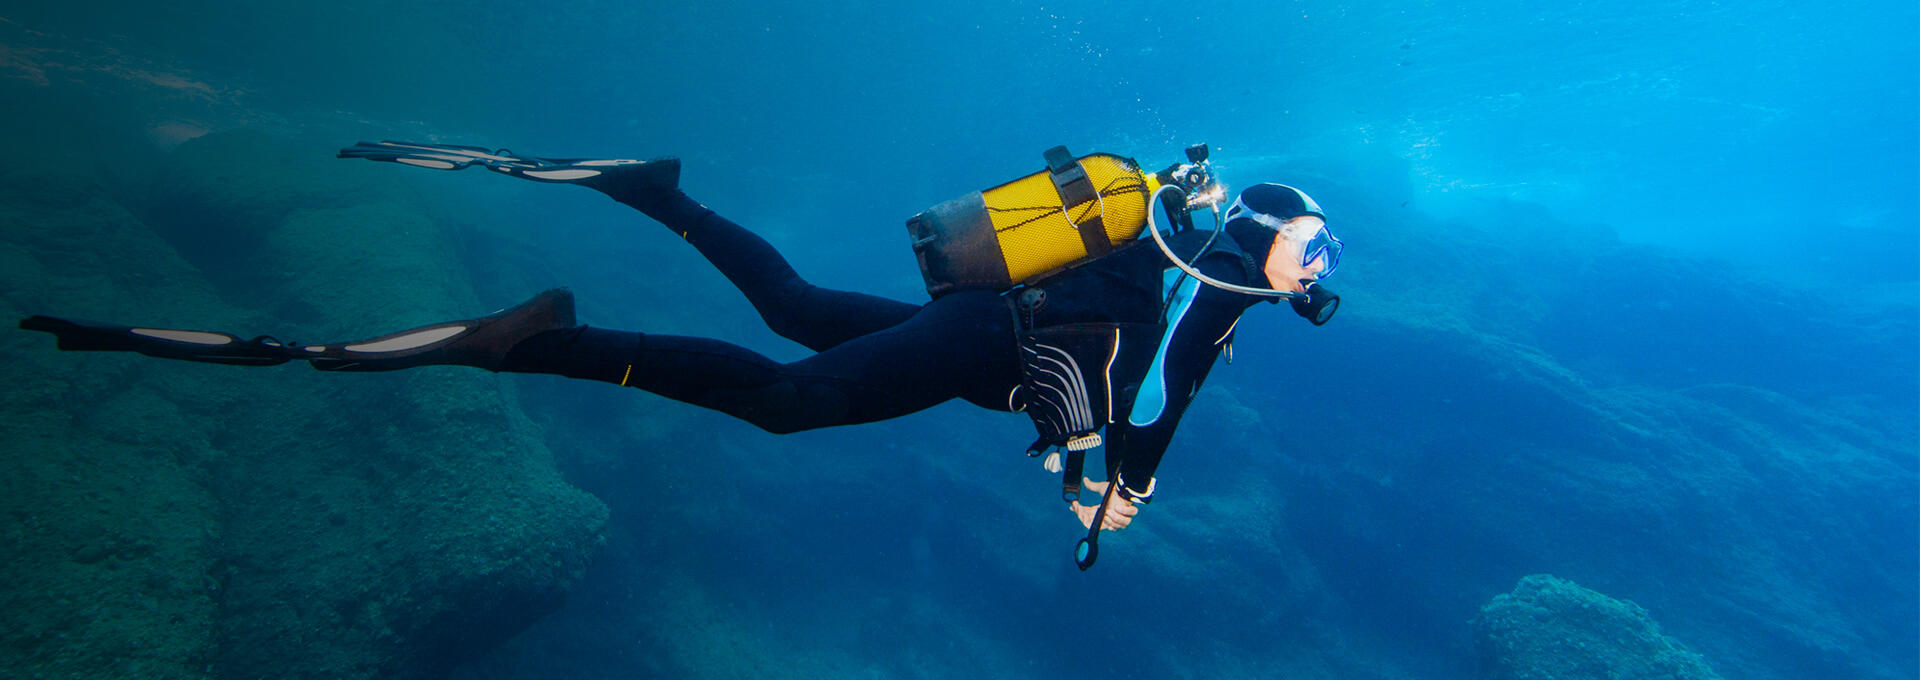 combinaison plongée sous-marine